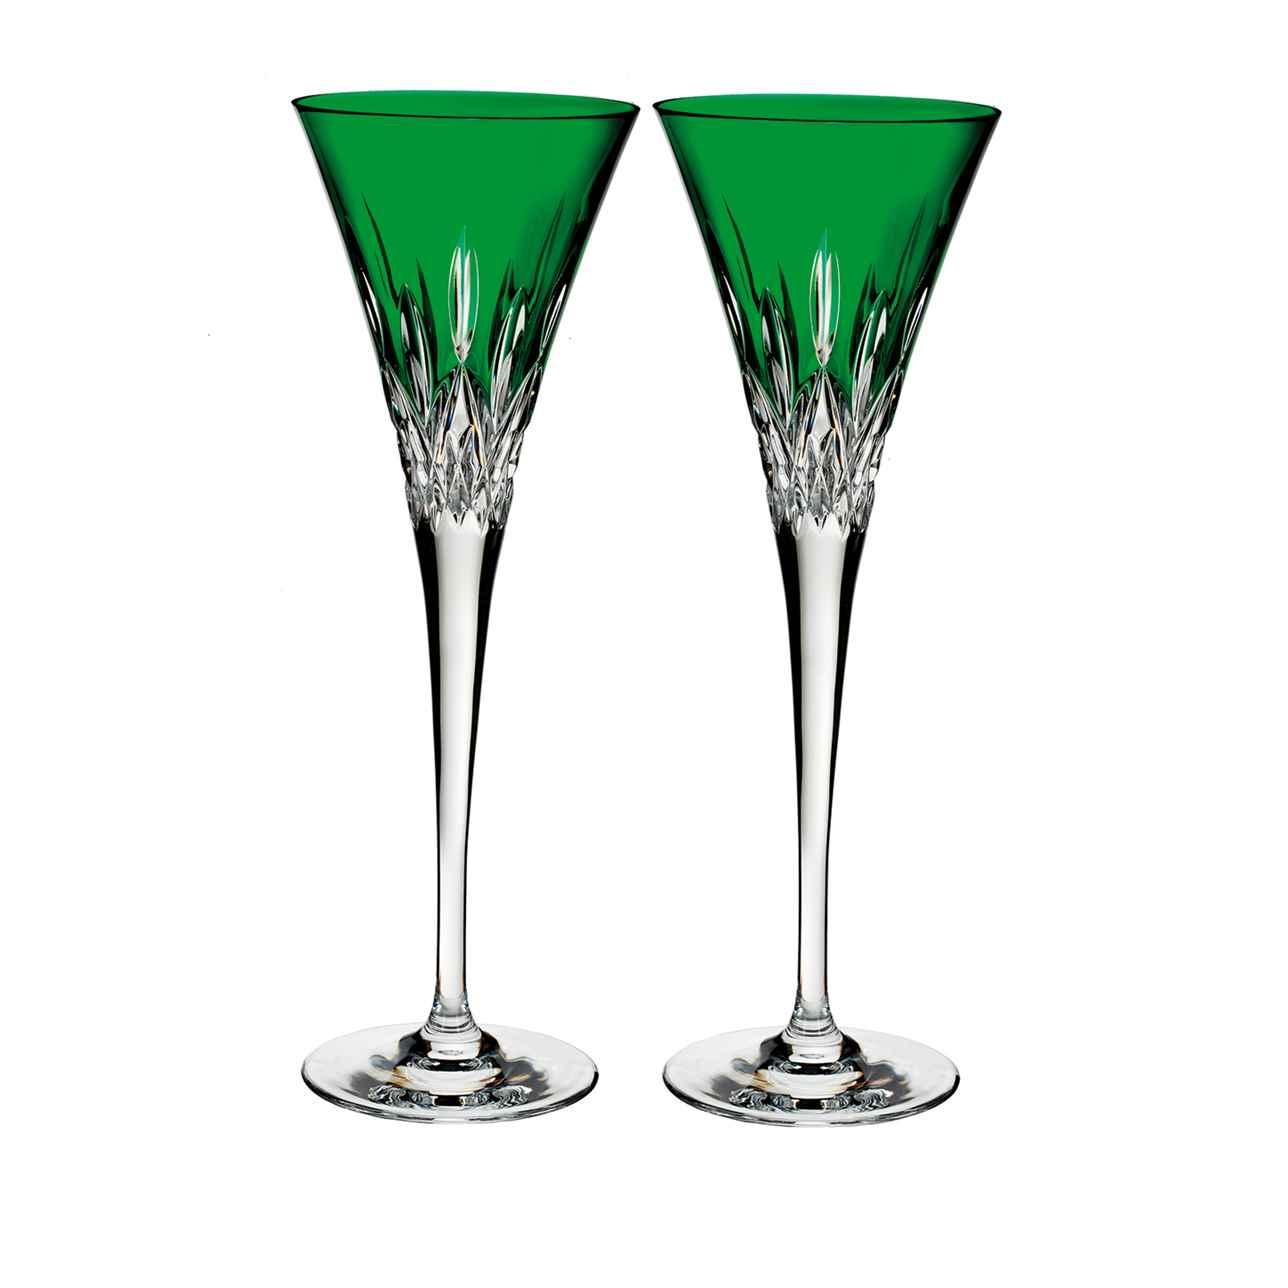 Lismore Pops Emerald Toasting Flute, Set of 2